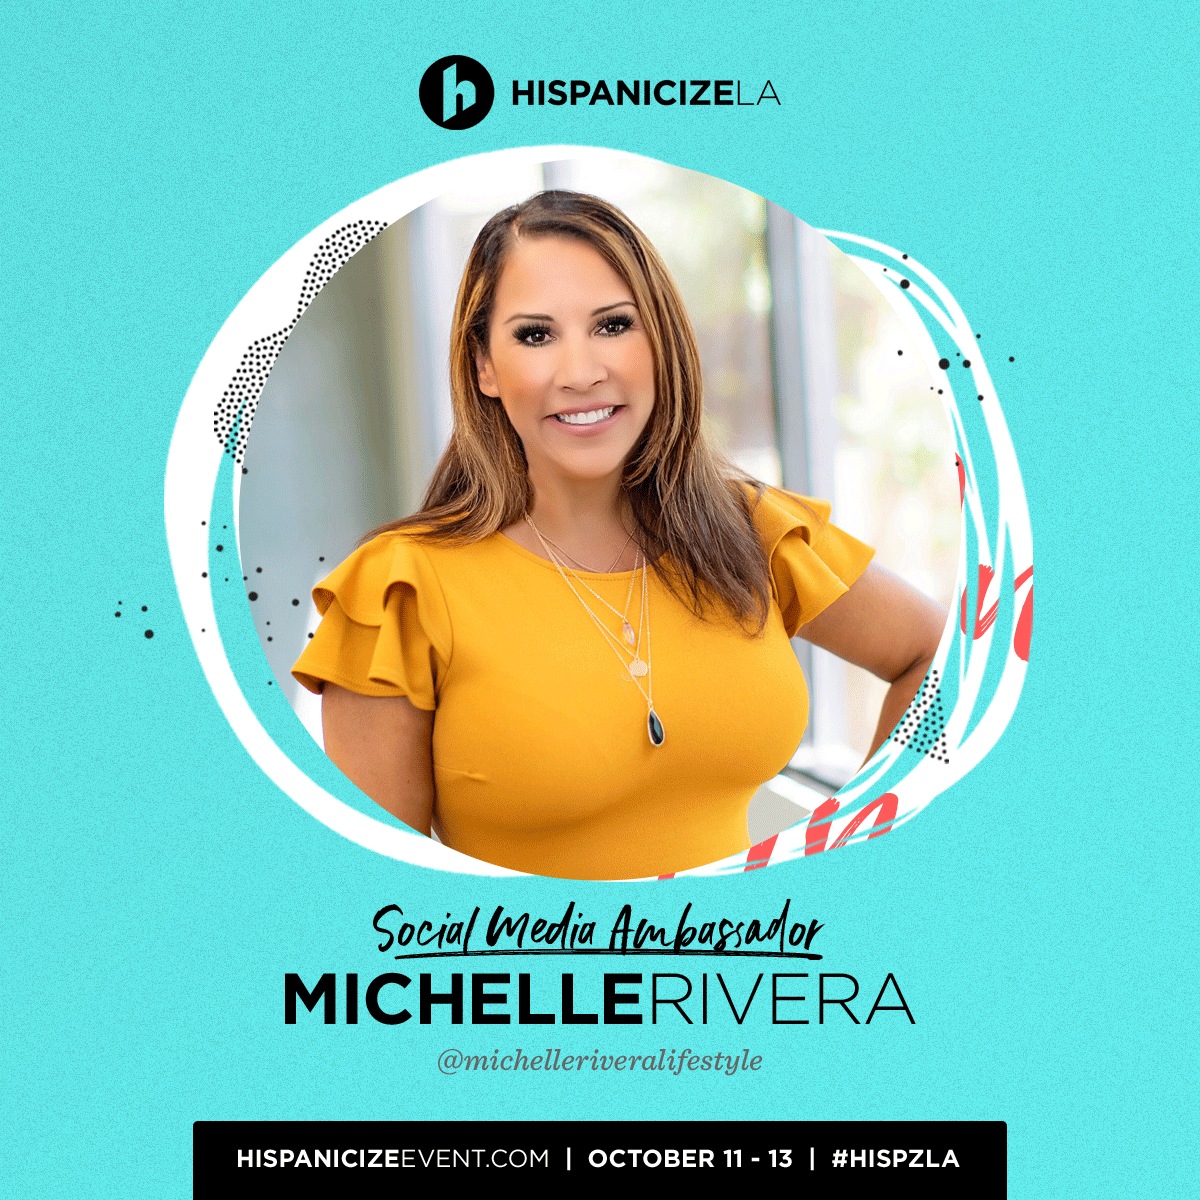 Michelle Rivera is Joining Hispanicize As A Social Media Ambassador. #HISPZLA